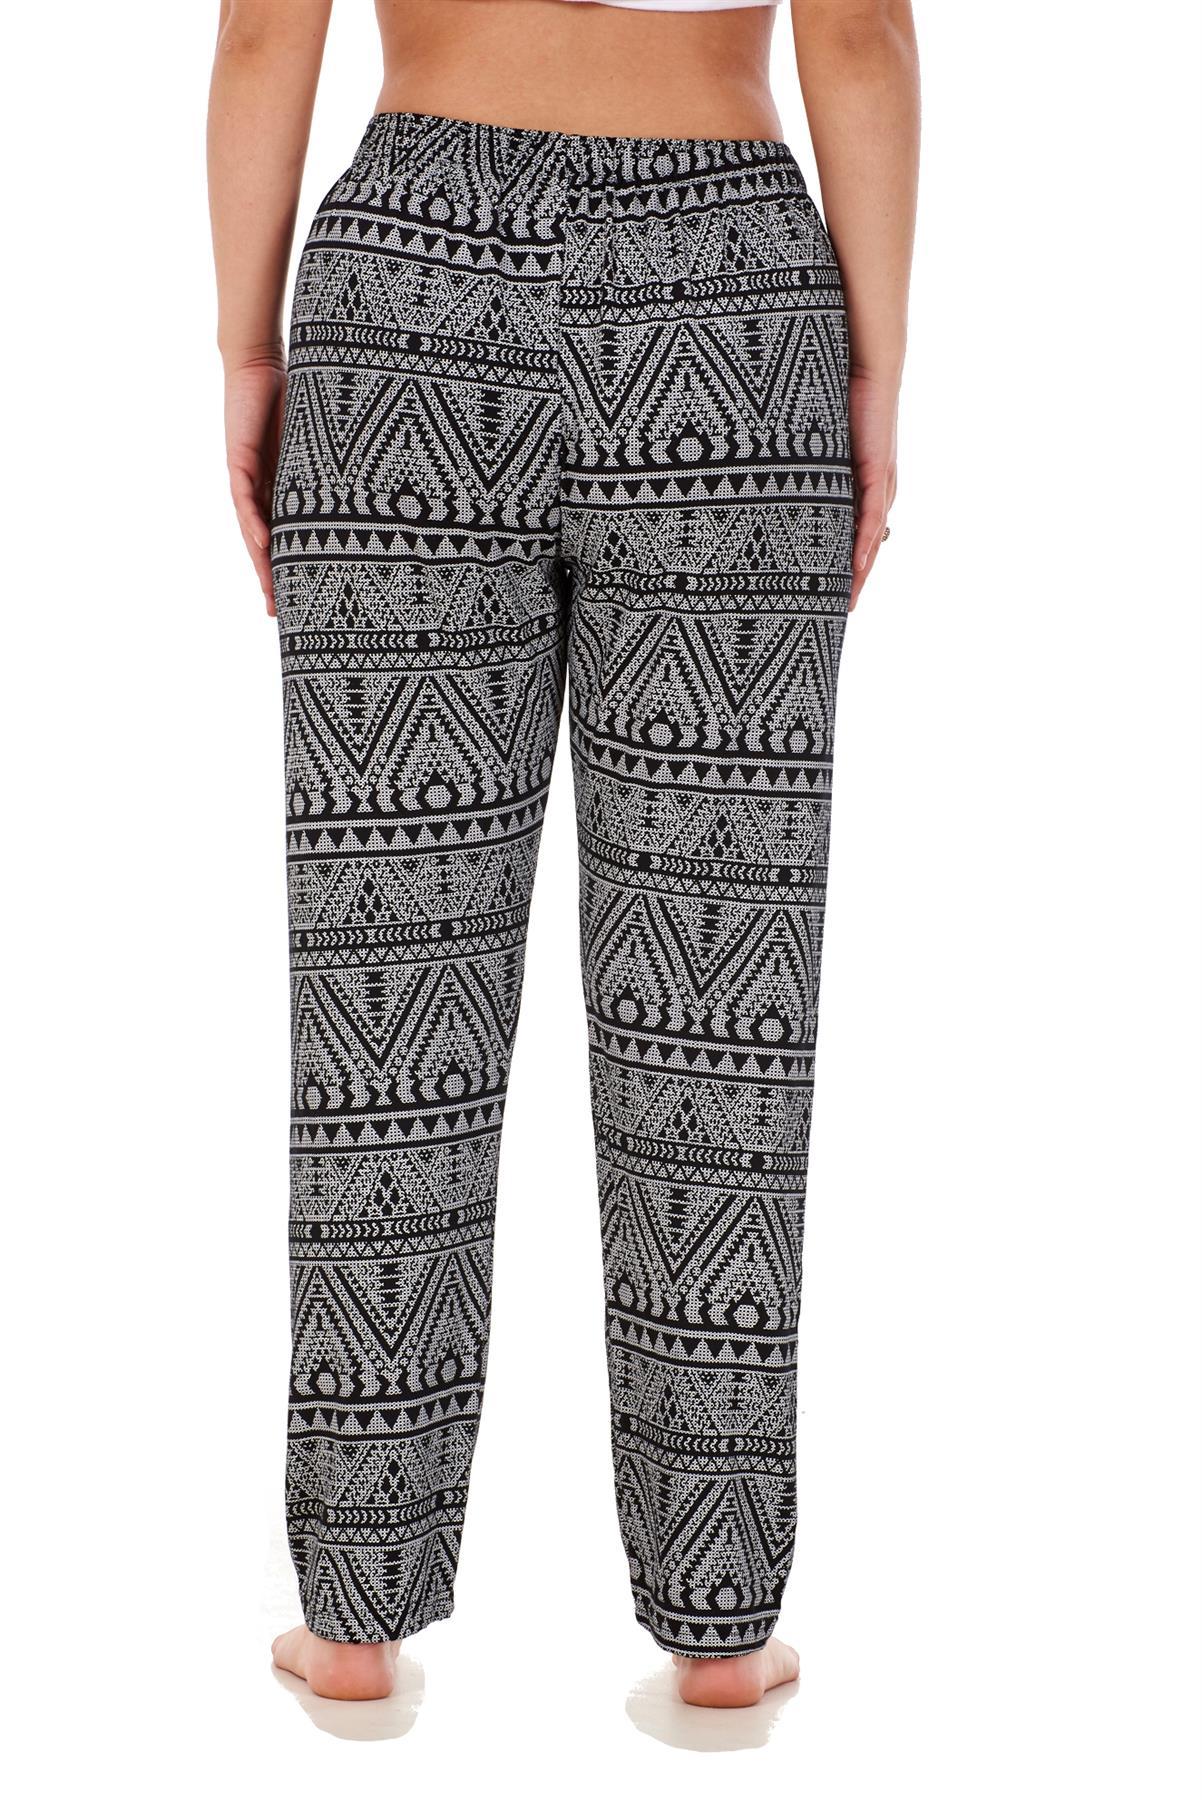 Ladies-Women-Trouser-Elasticated-Printed-Tapered-Harem-High-waist-Regular-Pants thumbnail 12